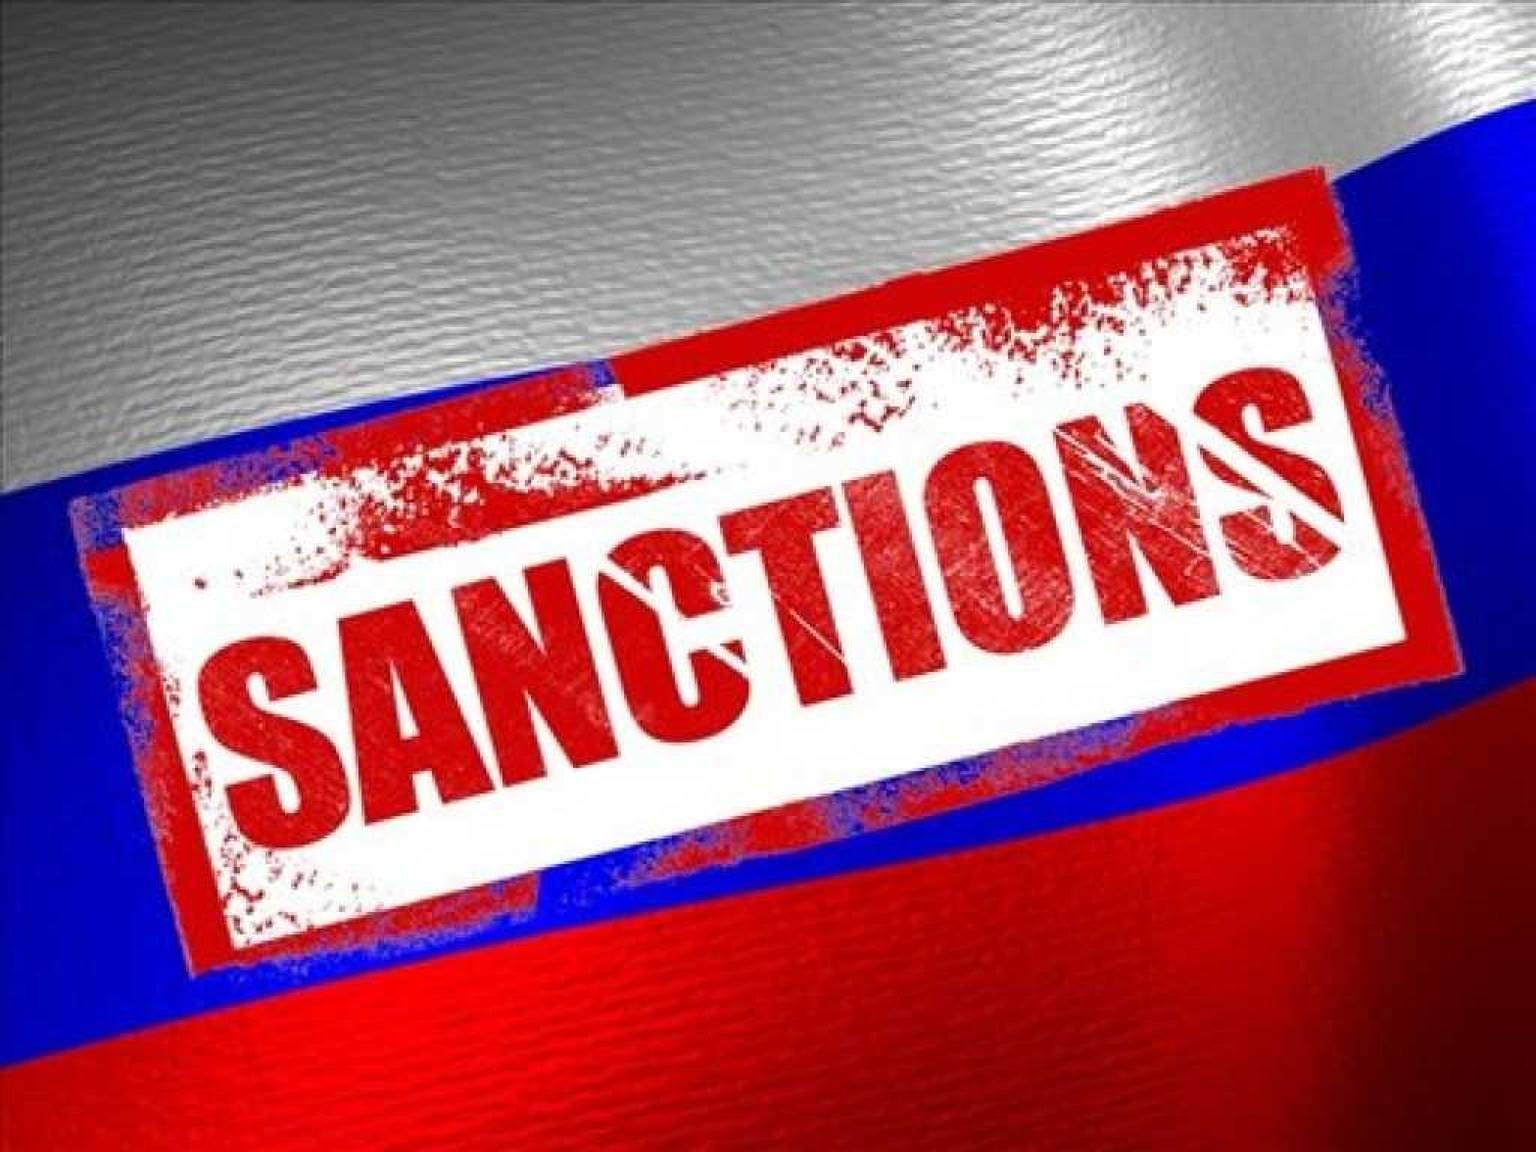 санкции картинки на рабочий стол хотим чистоты